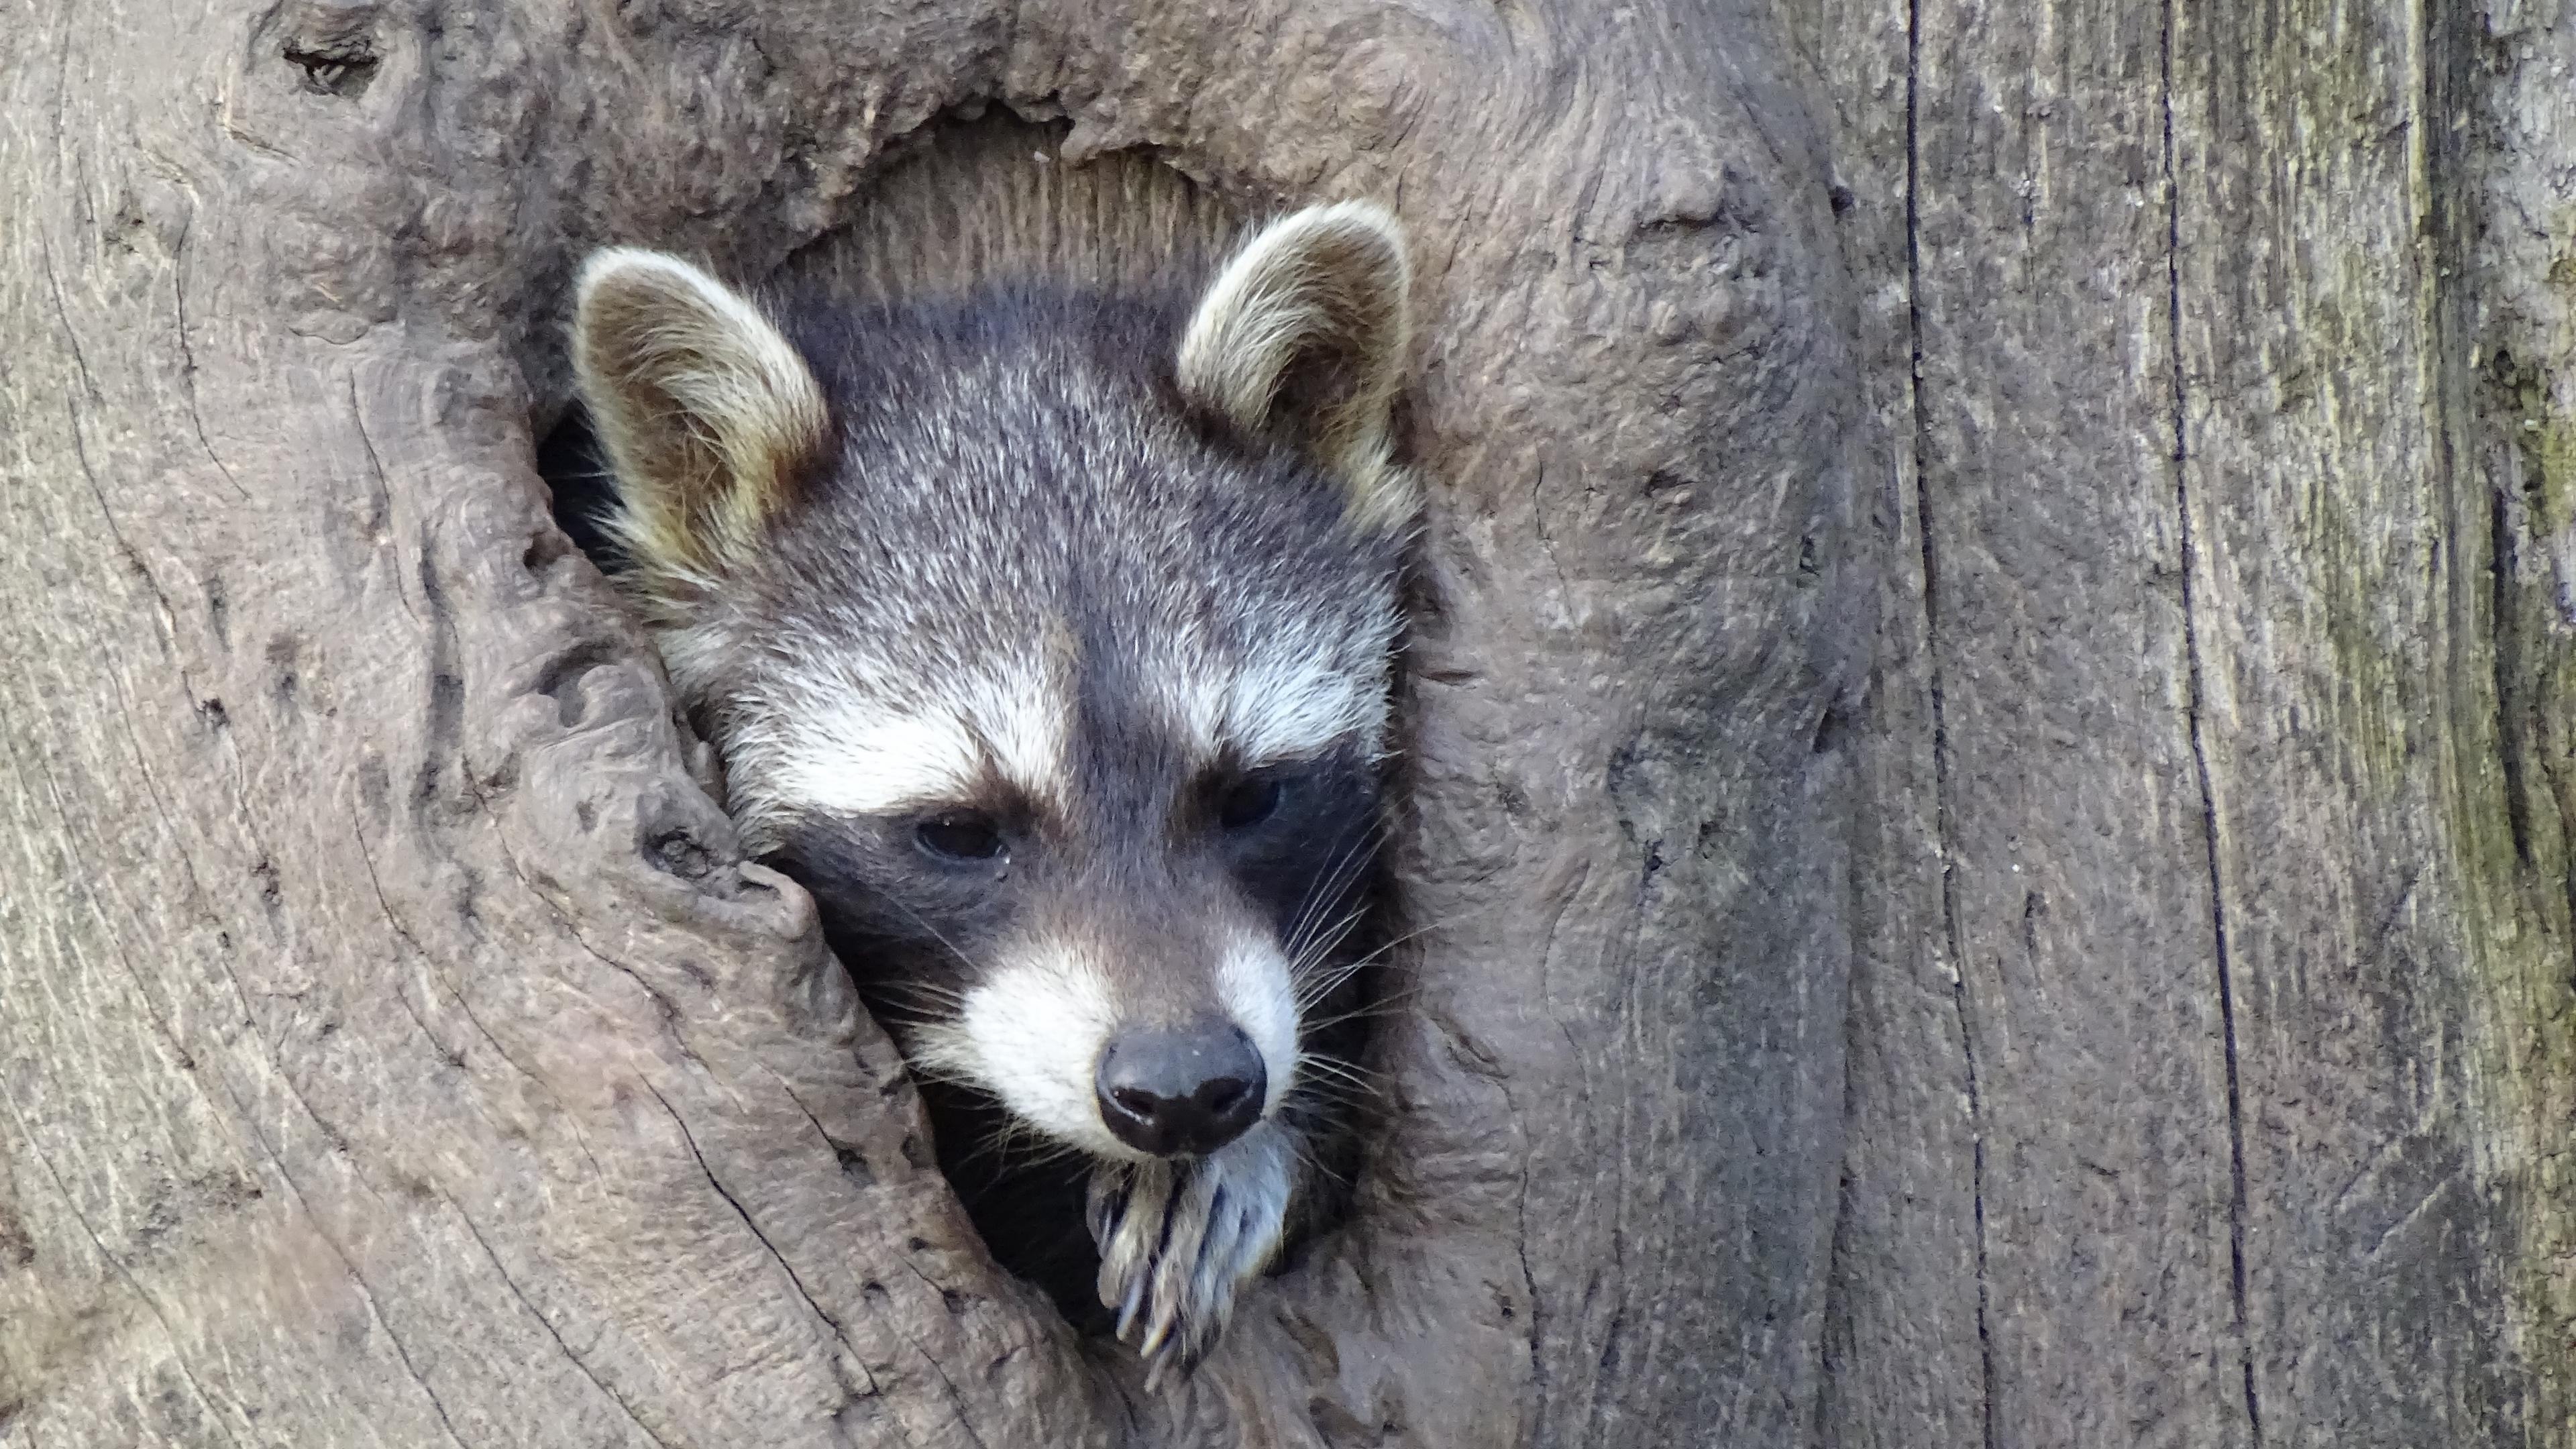 raccoon hollow tree face striped 4k 1542242427 - raccoon, hollow tree, face, striped 4k - raccoon, hollow tree, Face